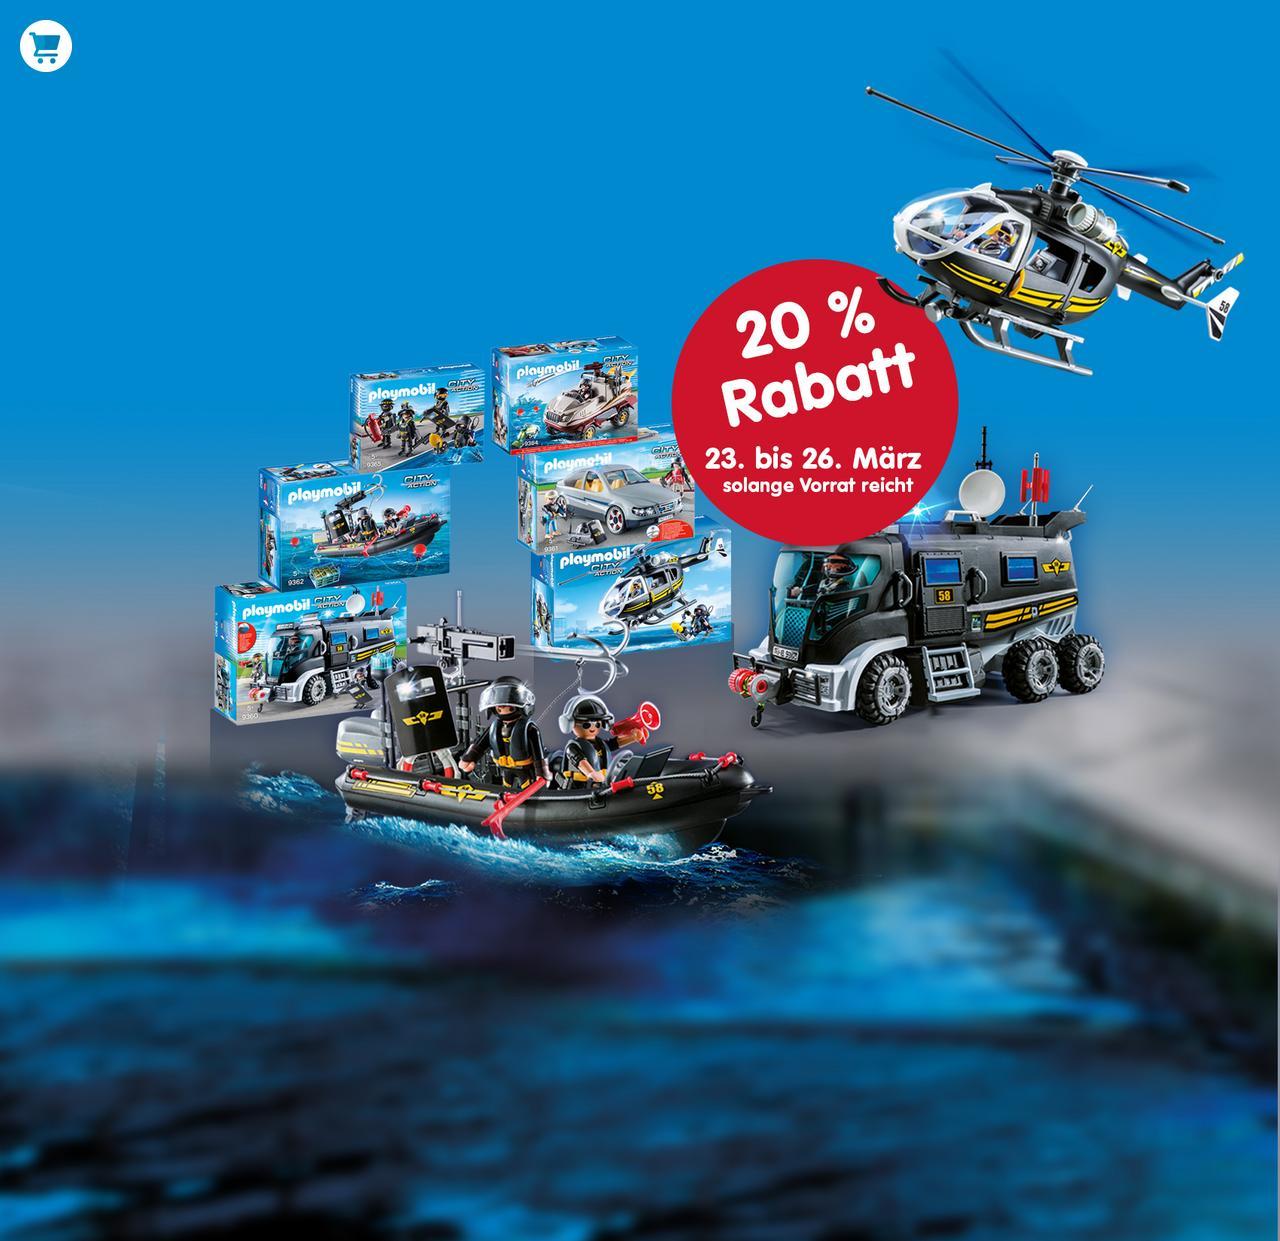 Playmobil gibt 20% auf SEK - Spielsets